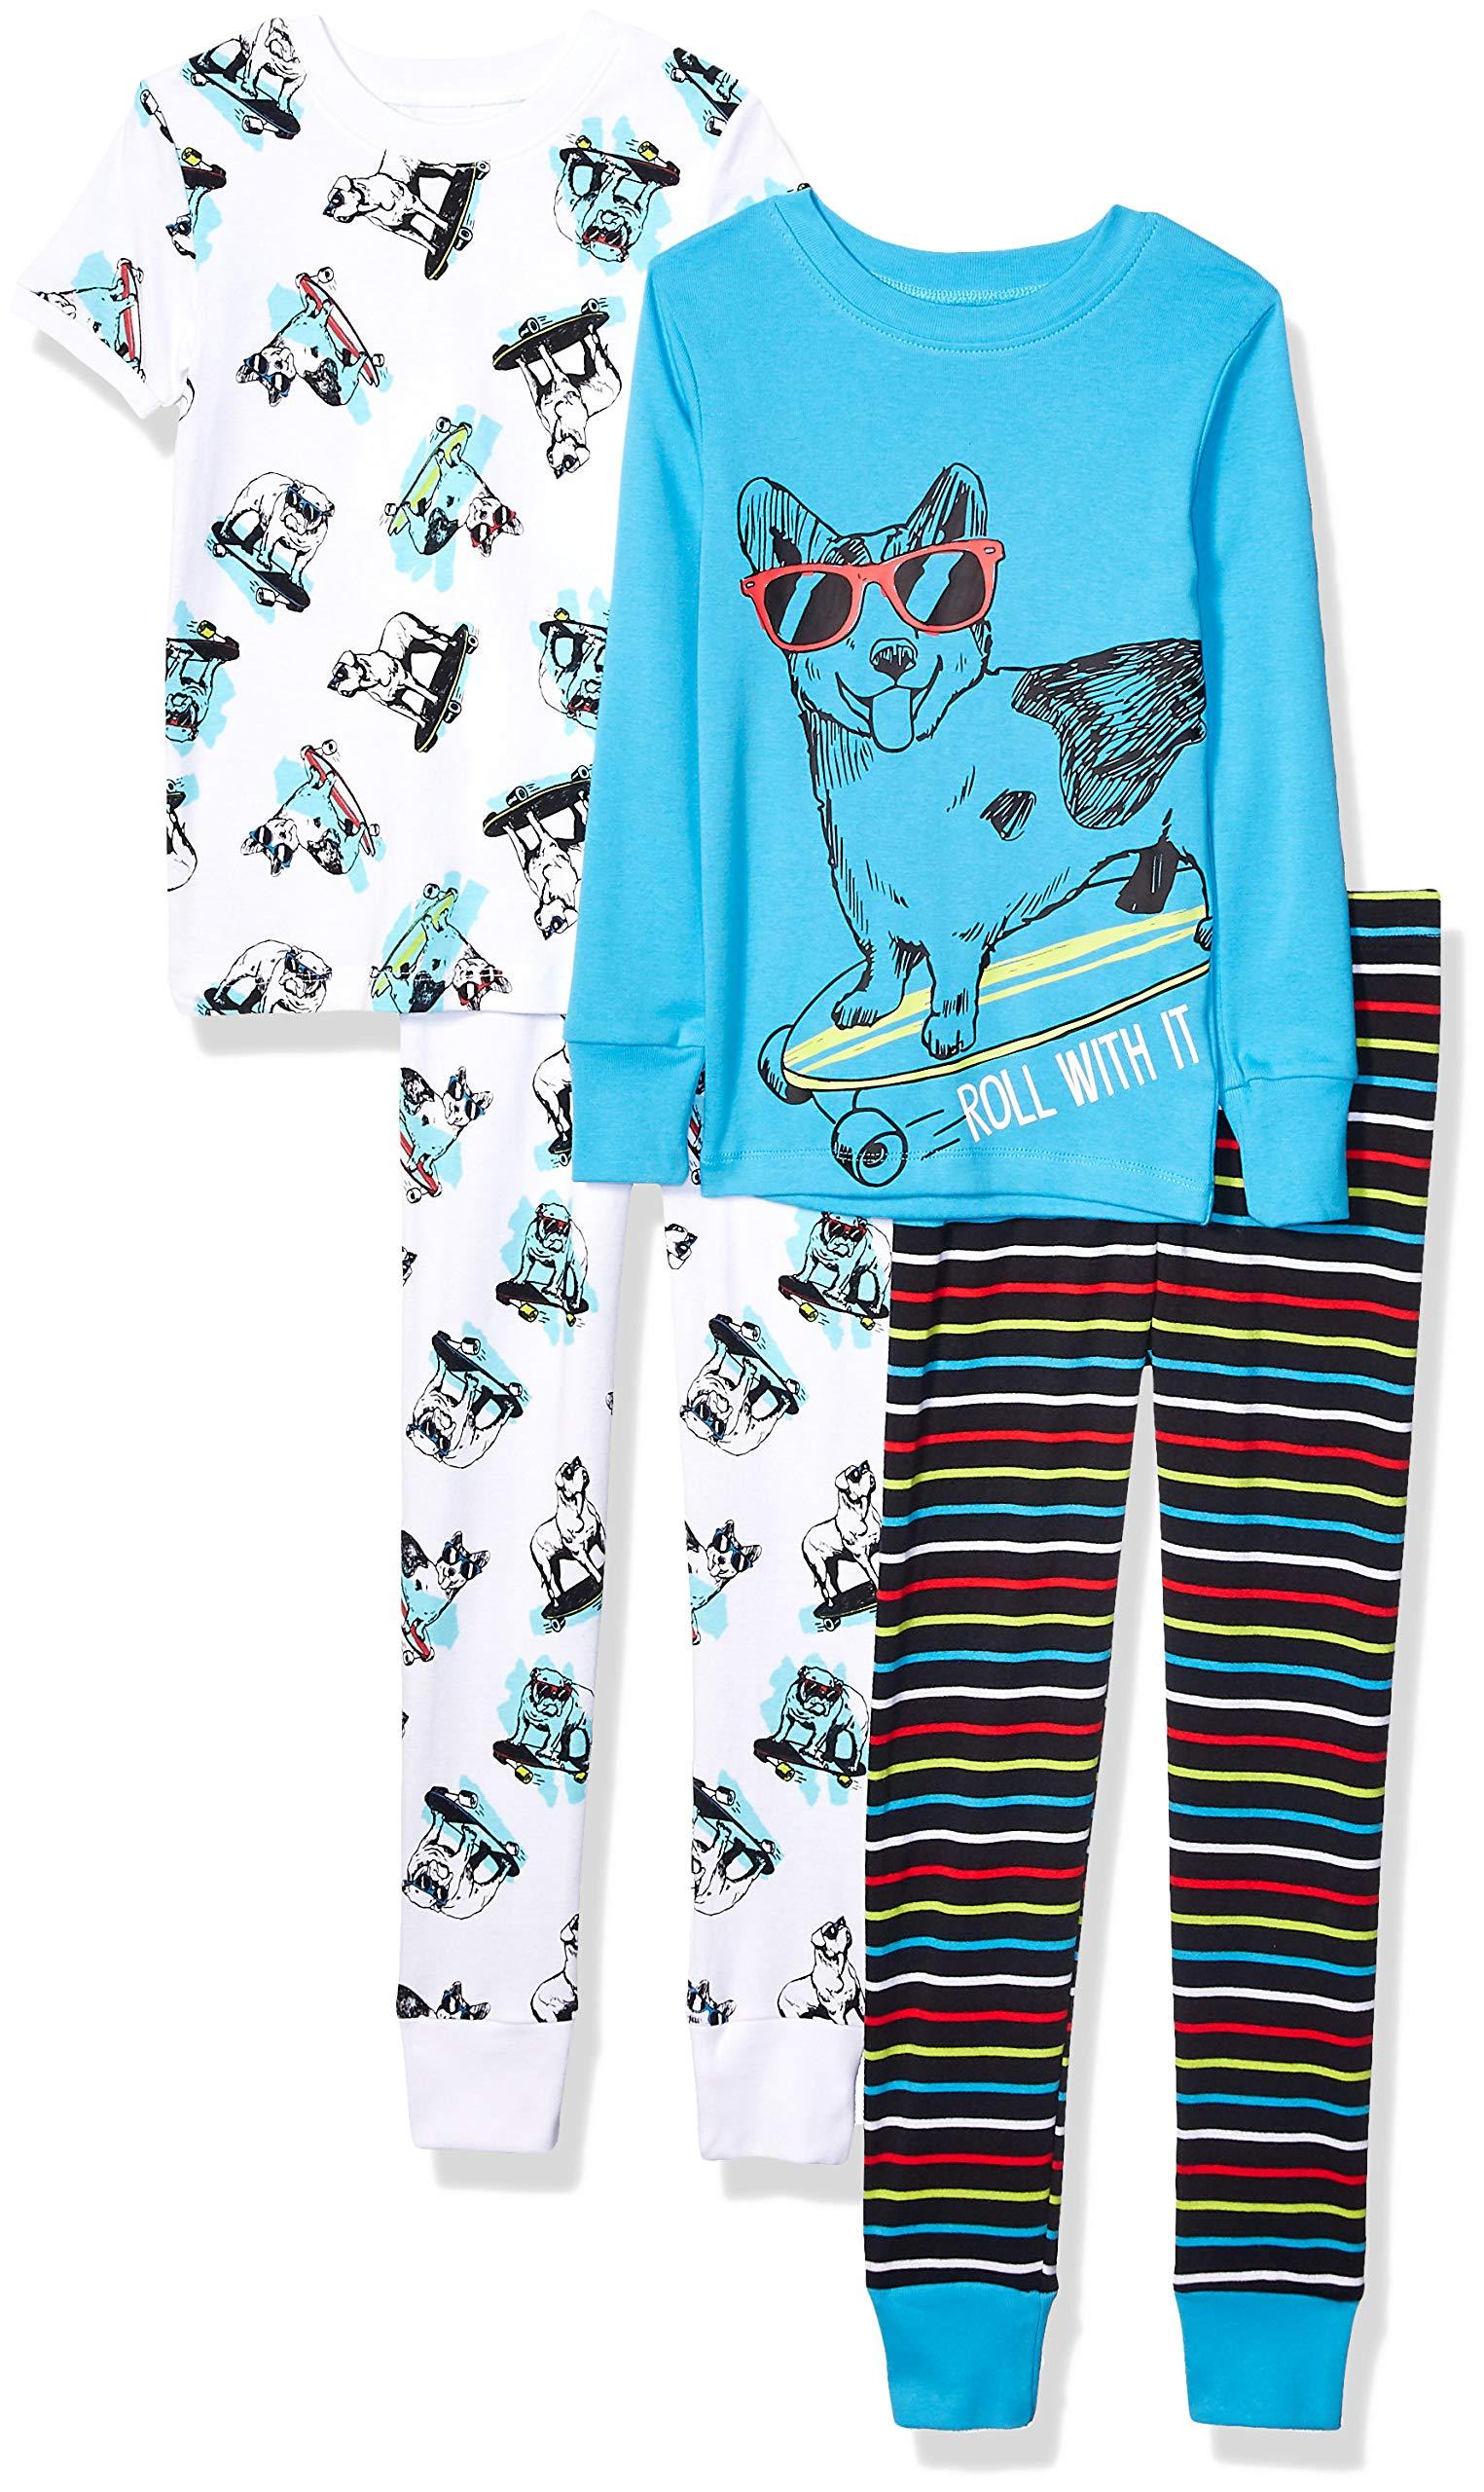 Marca Amazon - Spotted Zebra 4-Piece Snug-fit Cotton Pajama Set Unisex niños 1